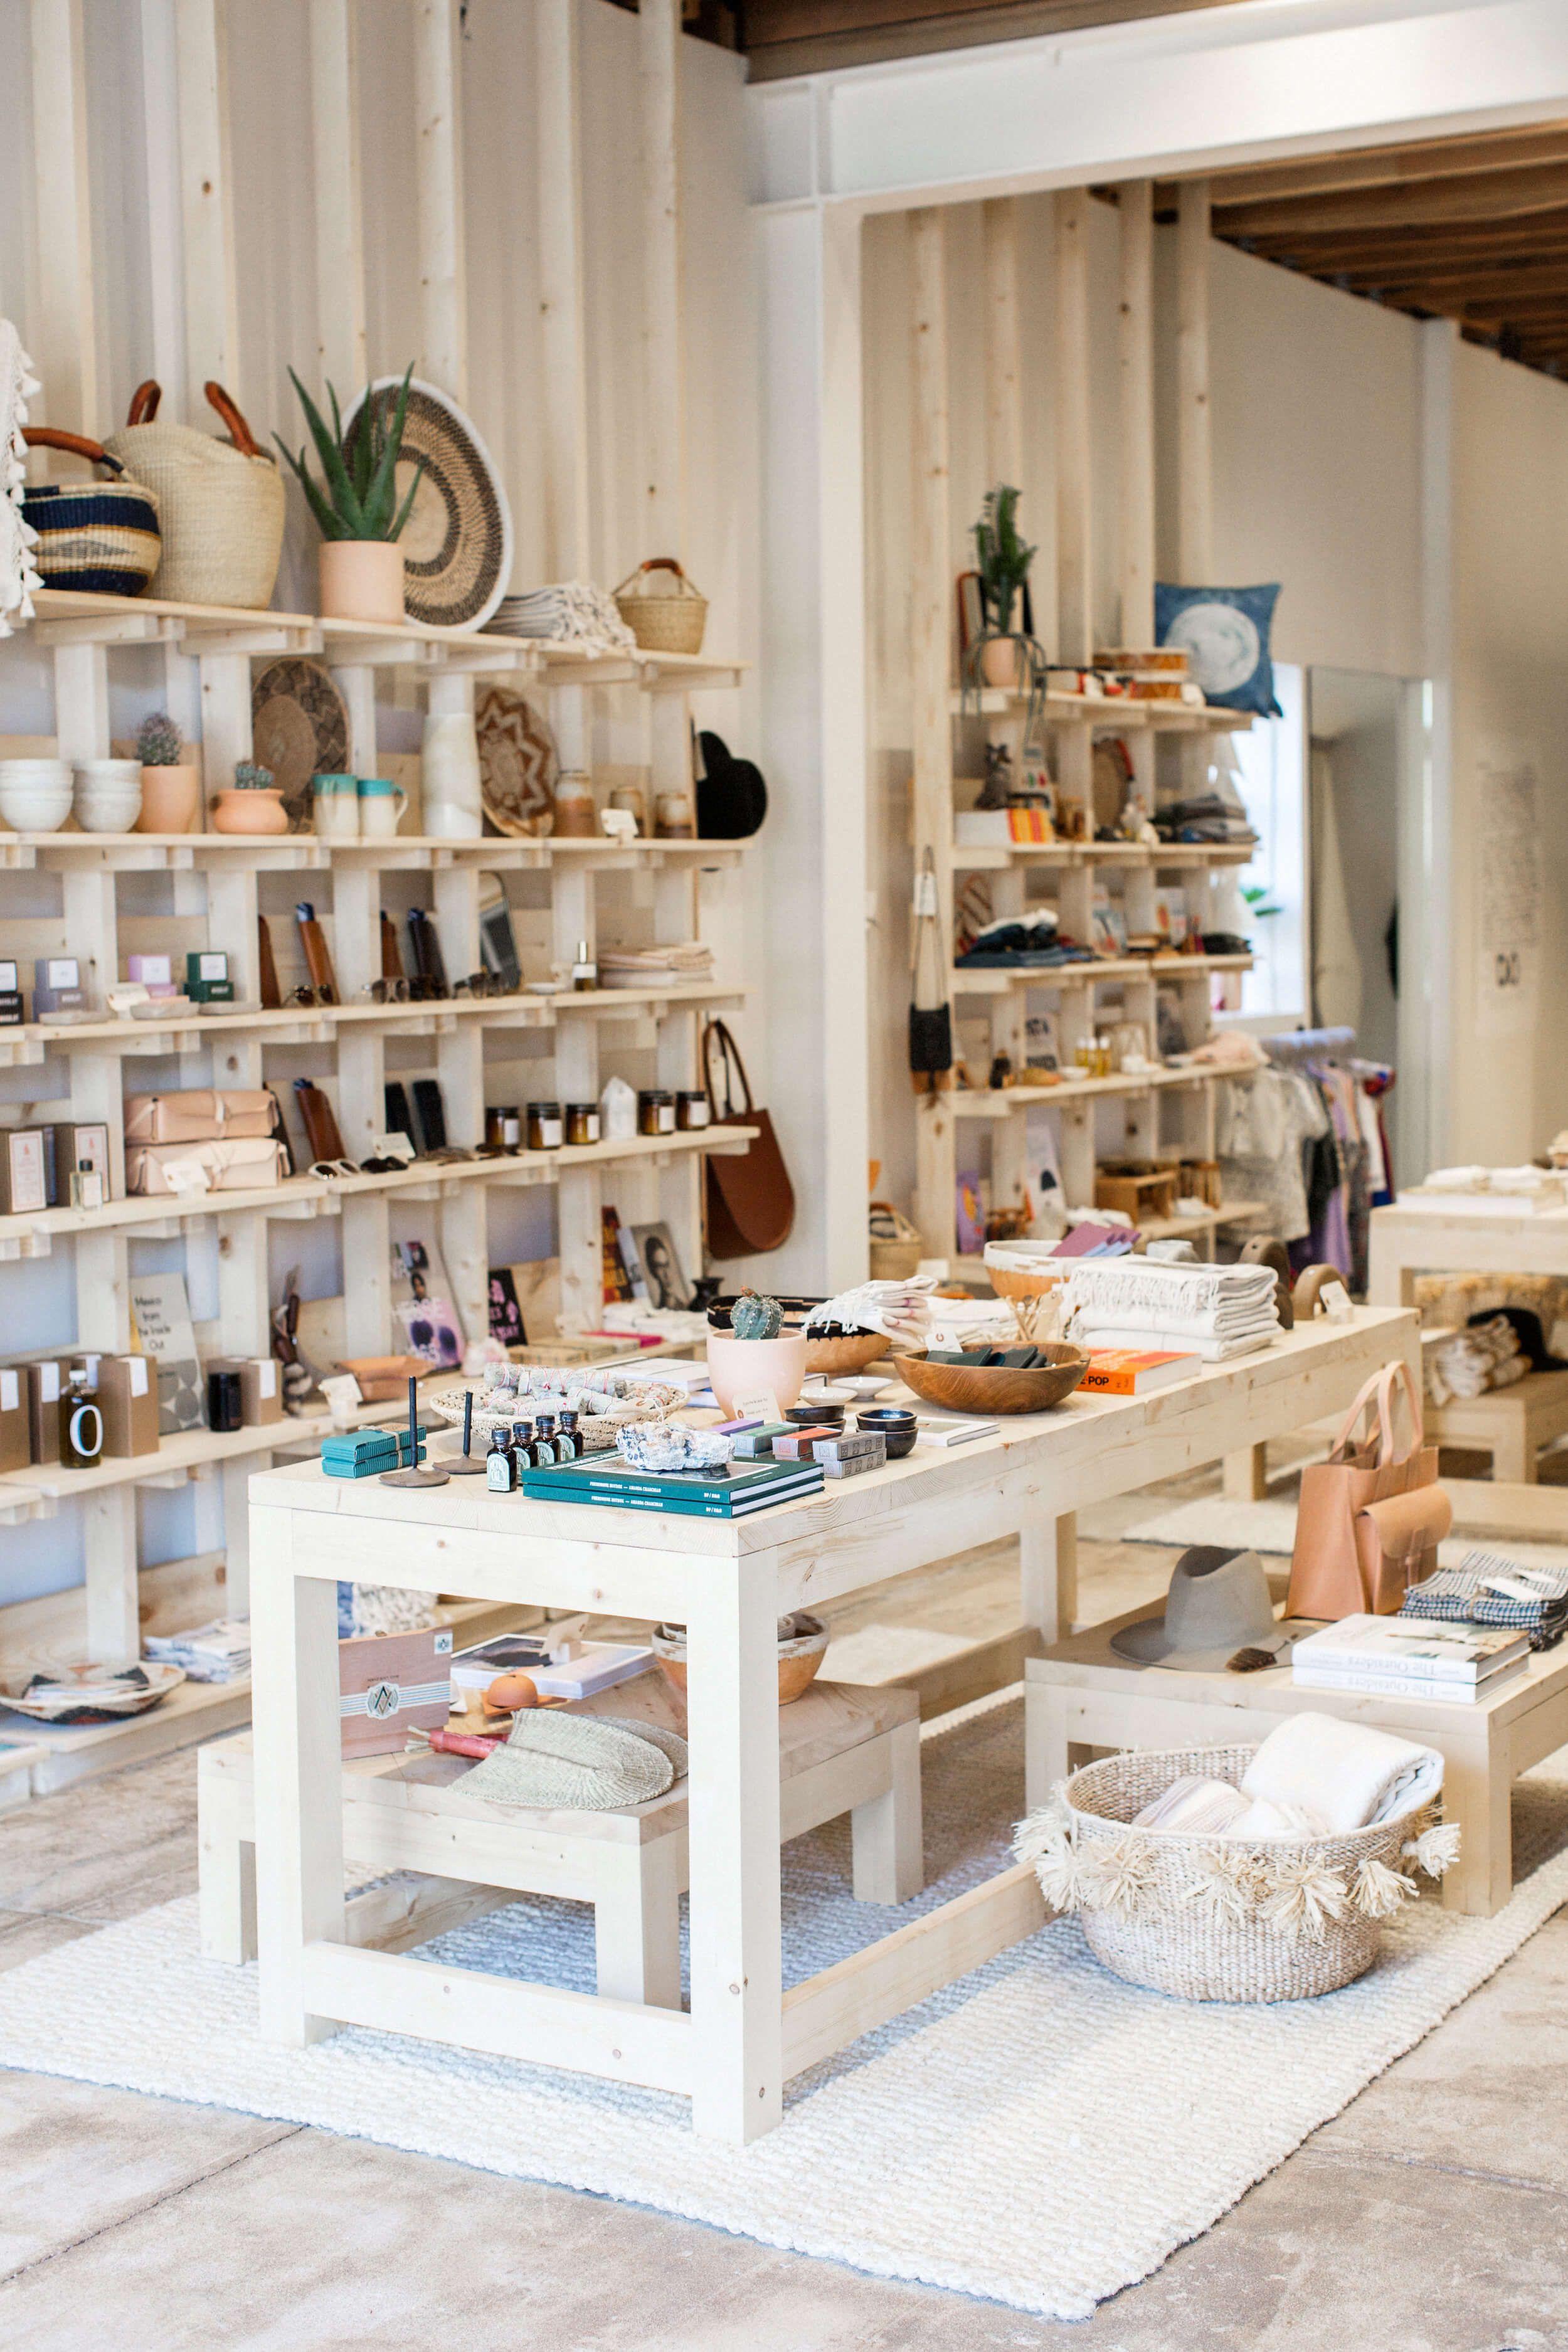 Midland Shop In Culver City Shop Chic Retail Store